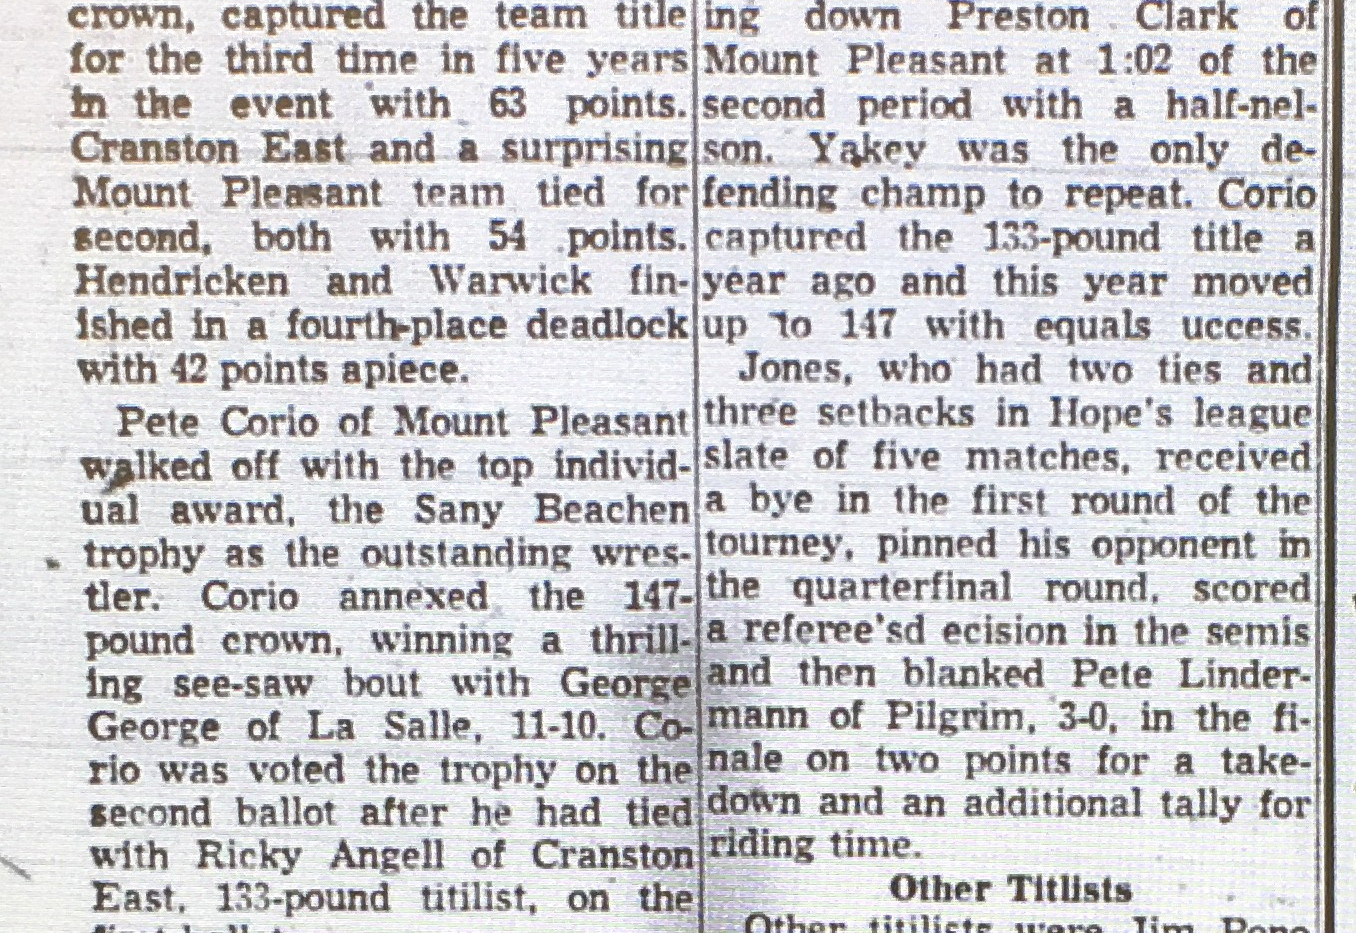 1964 State Tournament